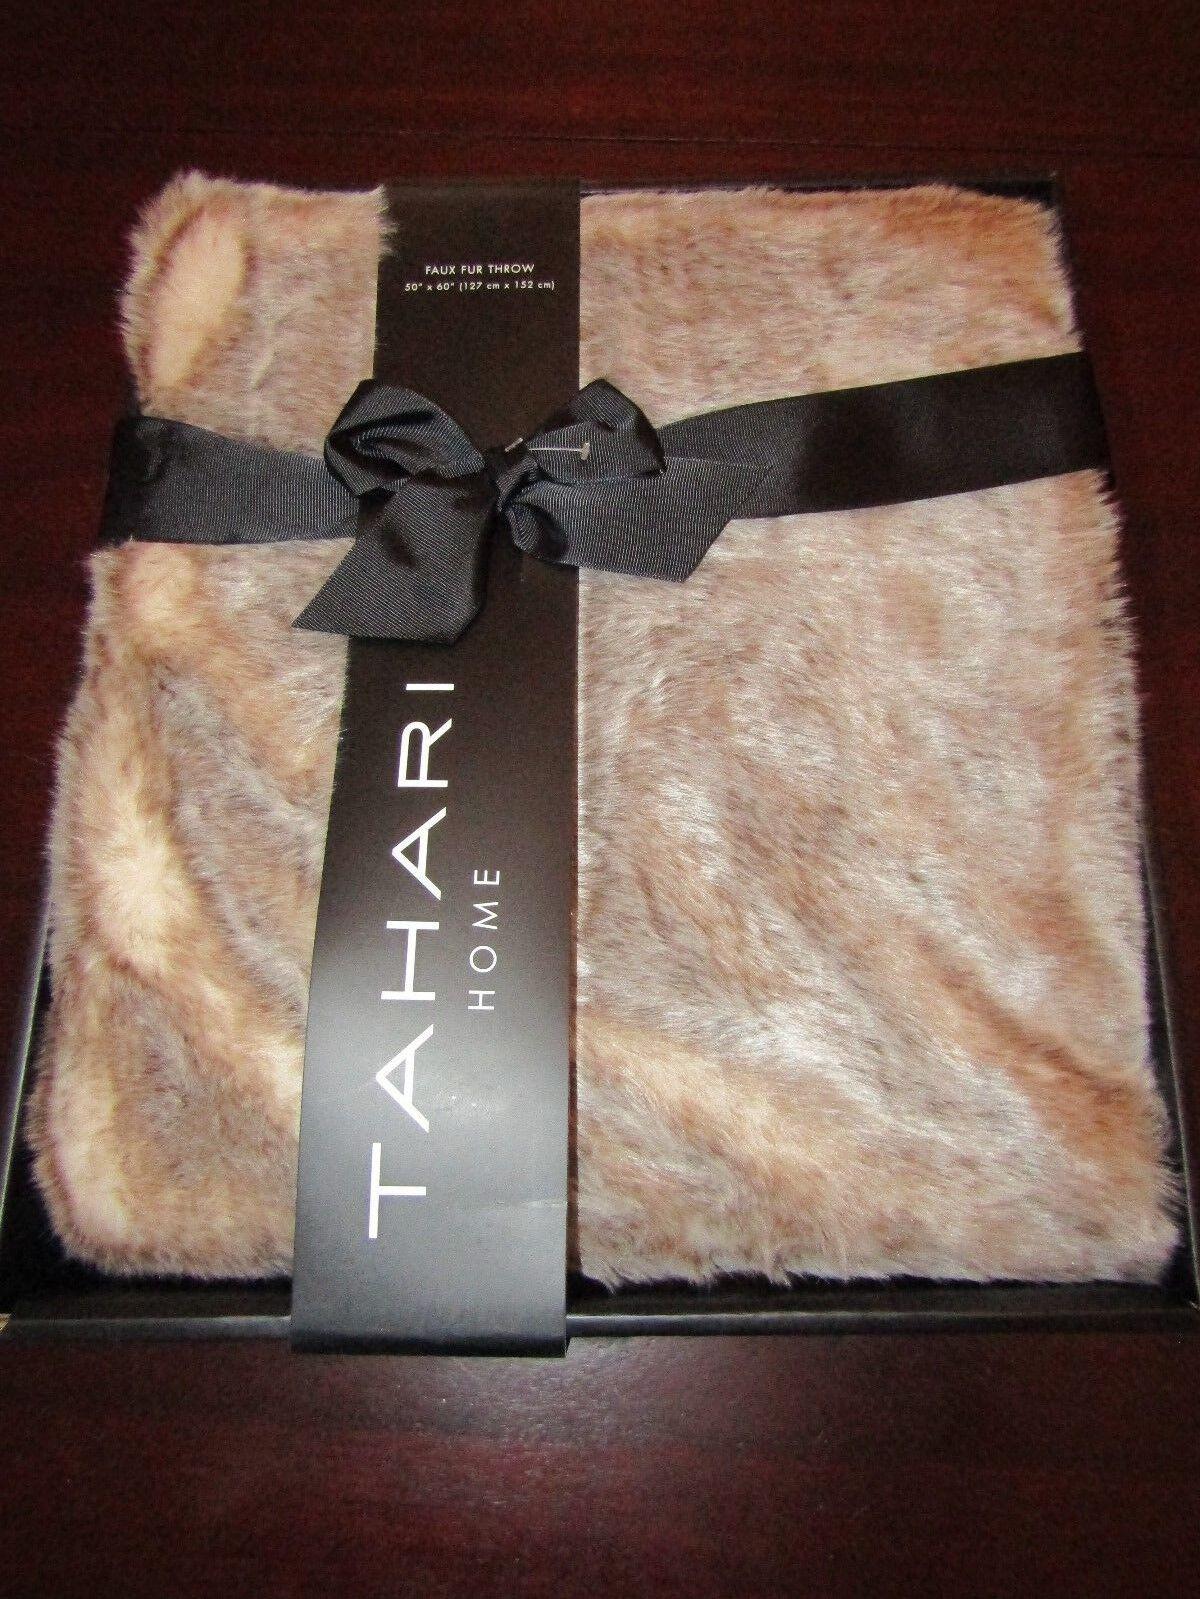 Tahari faux fur blanket throw 50x60 nwt new in original box